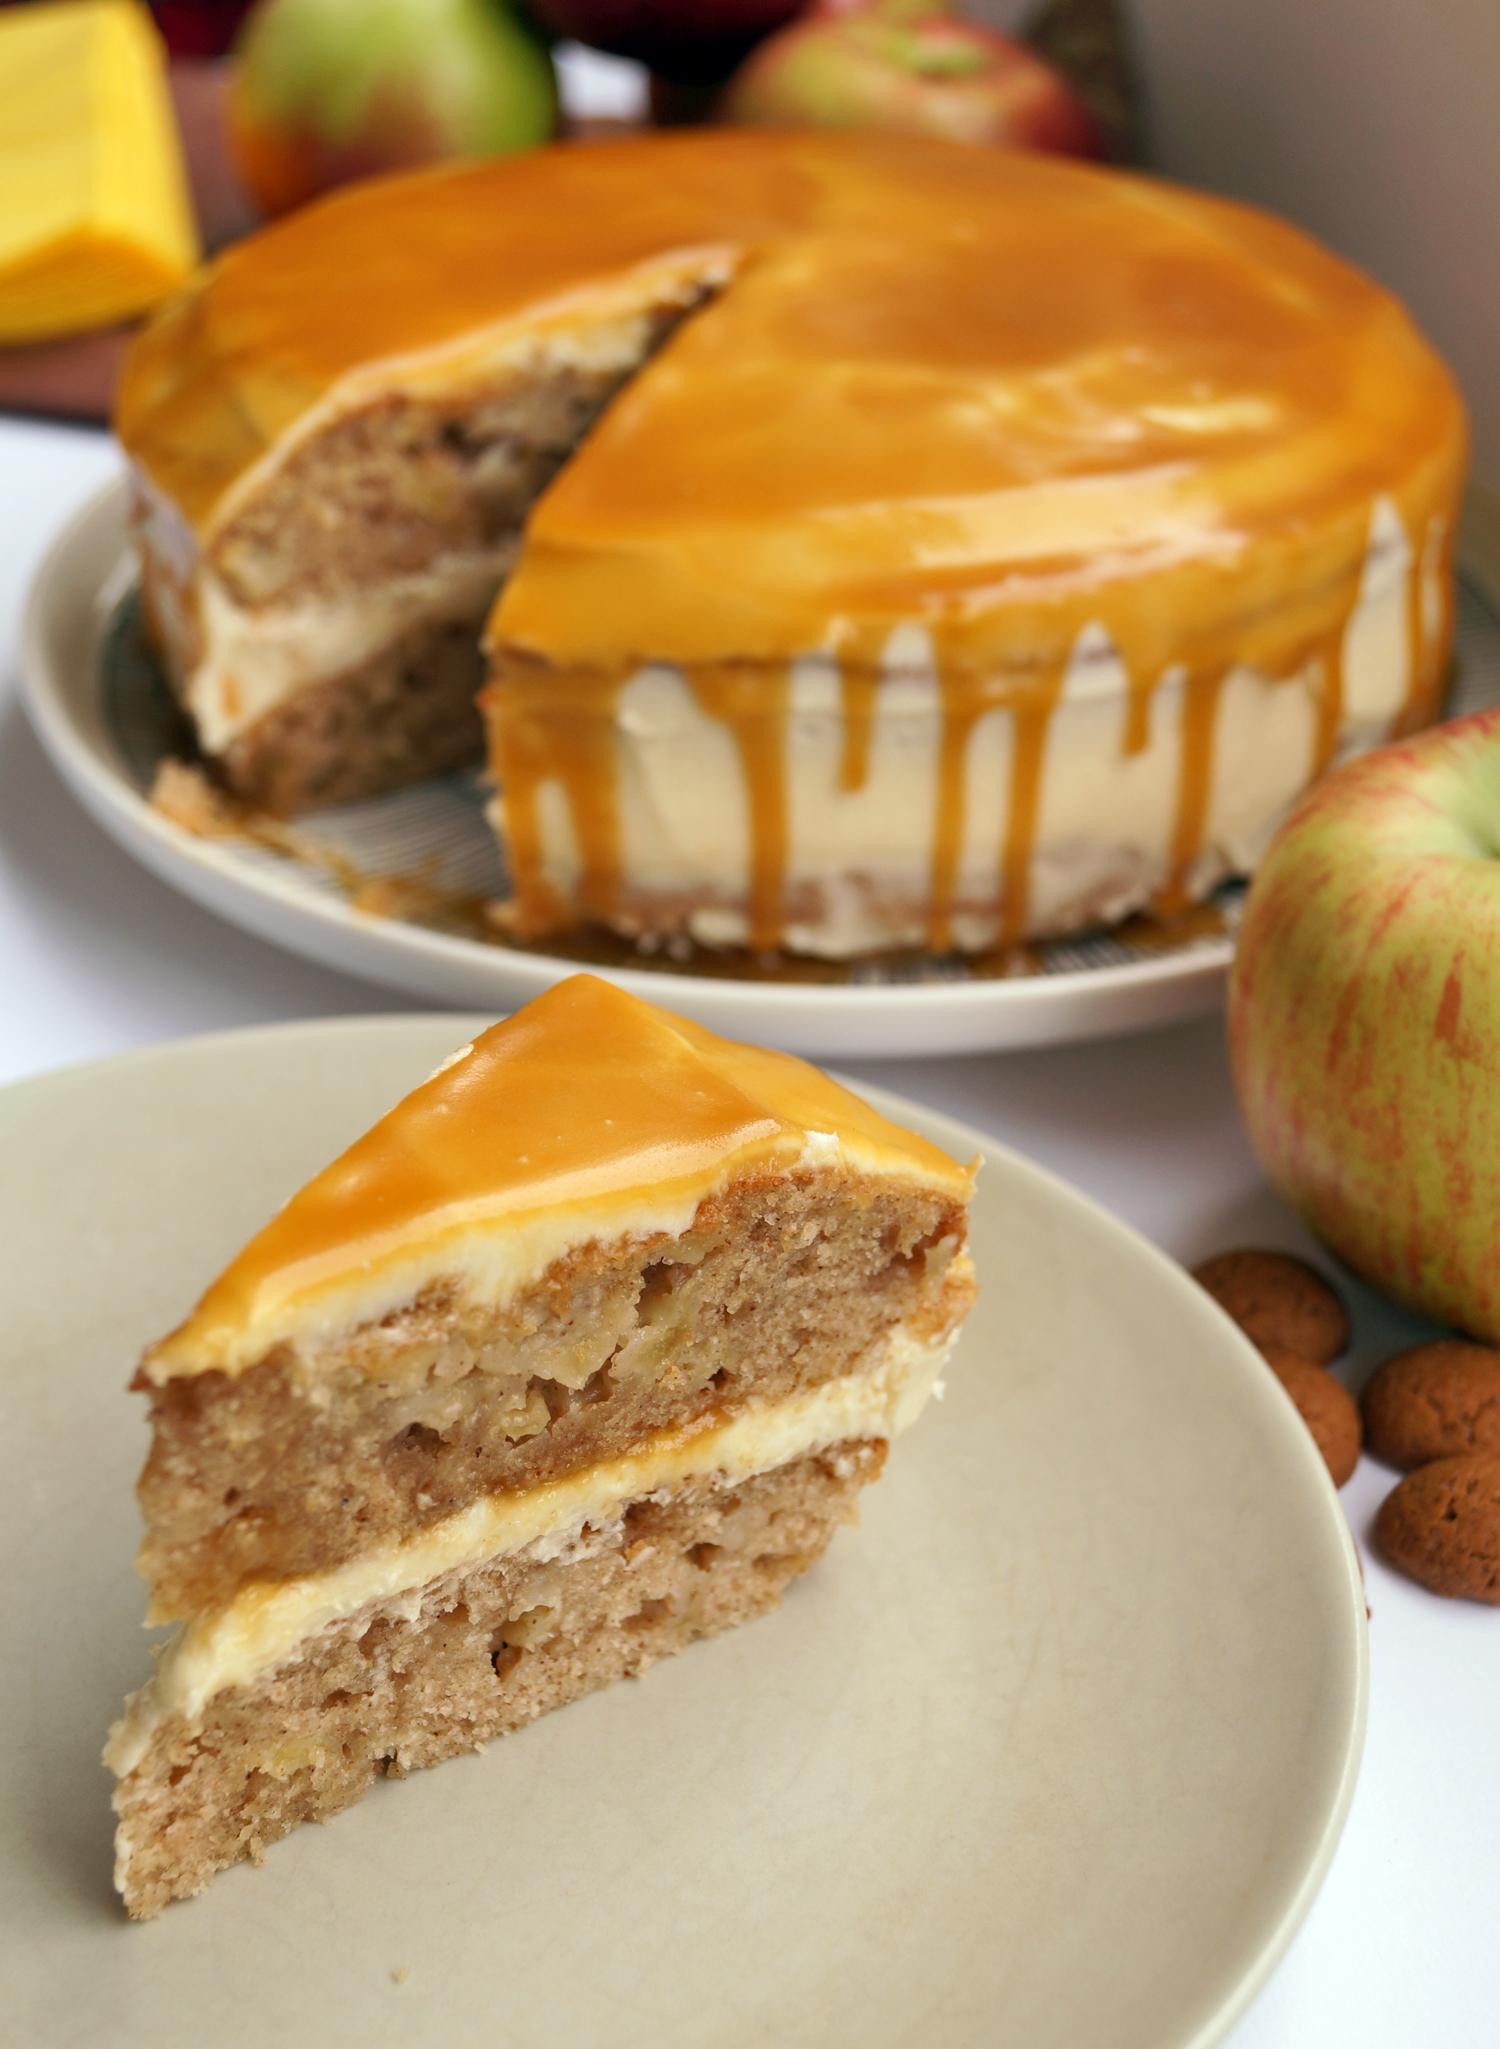 Ciasto z jabłkami kremem i karmelem - najlepsze ciasto na jesień